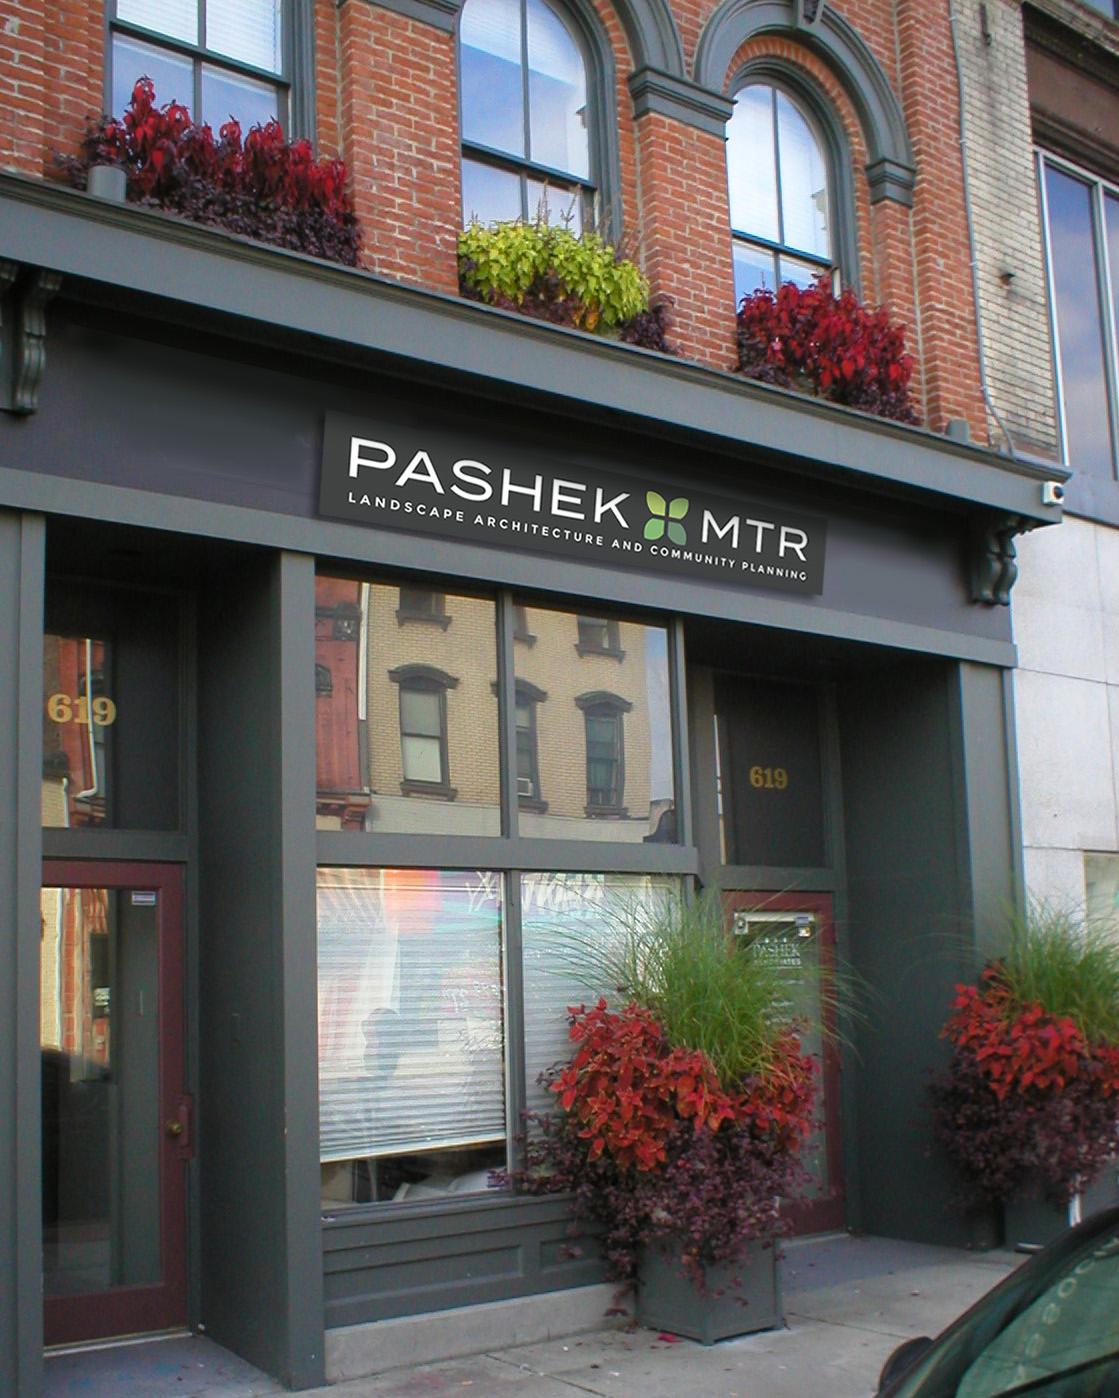 Pashek associates and mtr landscape architects have merged for Mtr landscape architects